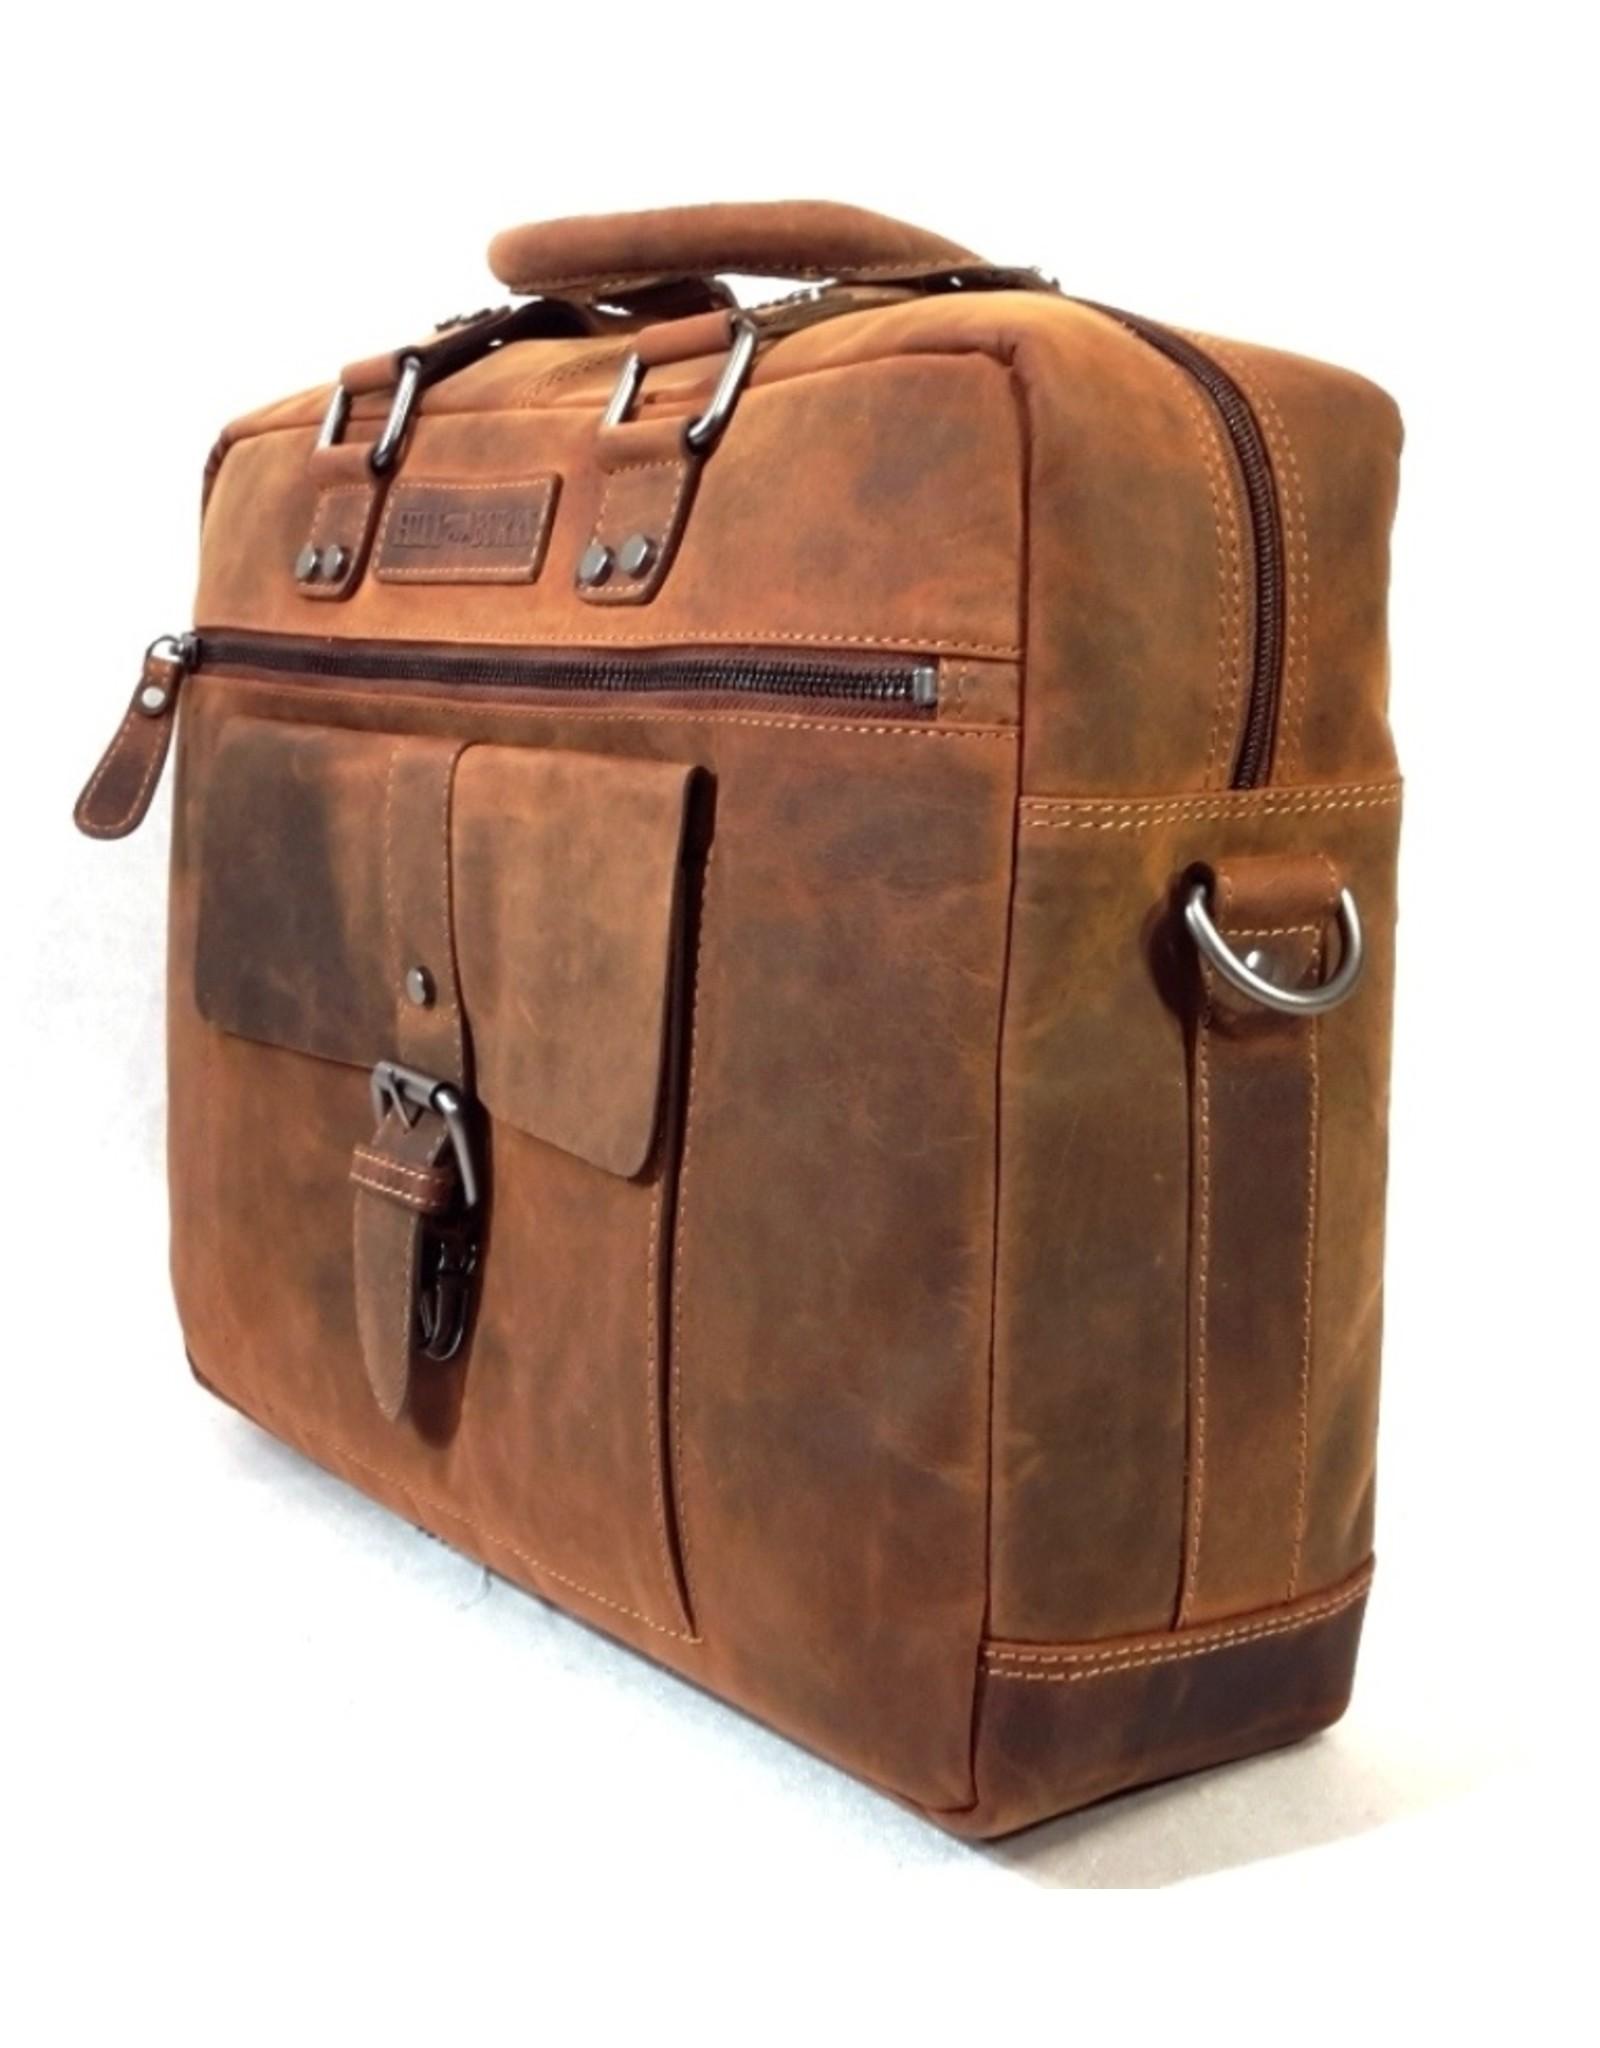 HillBurry Leather bags - HillBurry Leather Laptop bag (Buffalo leather)